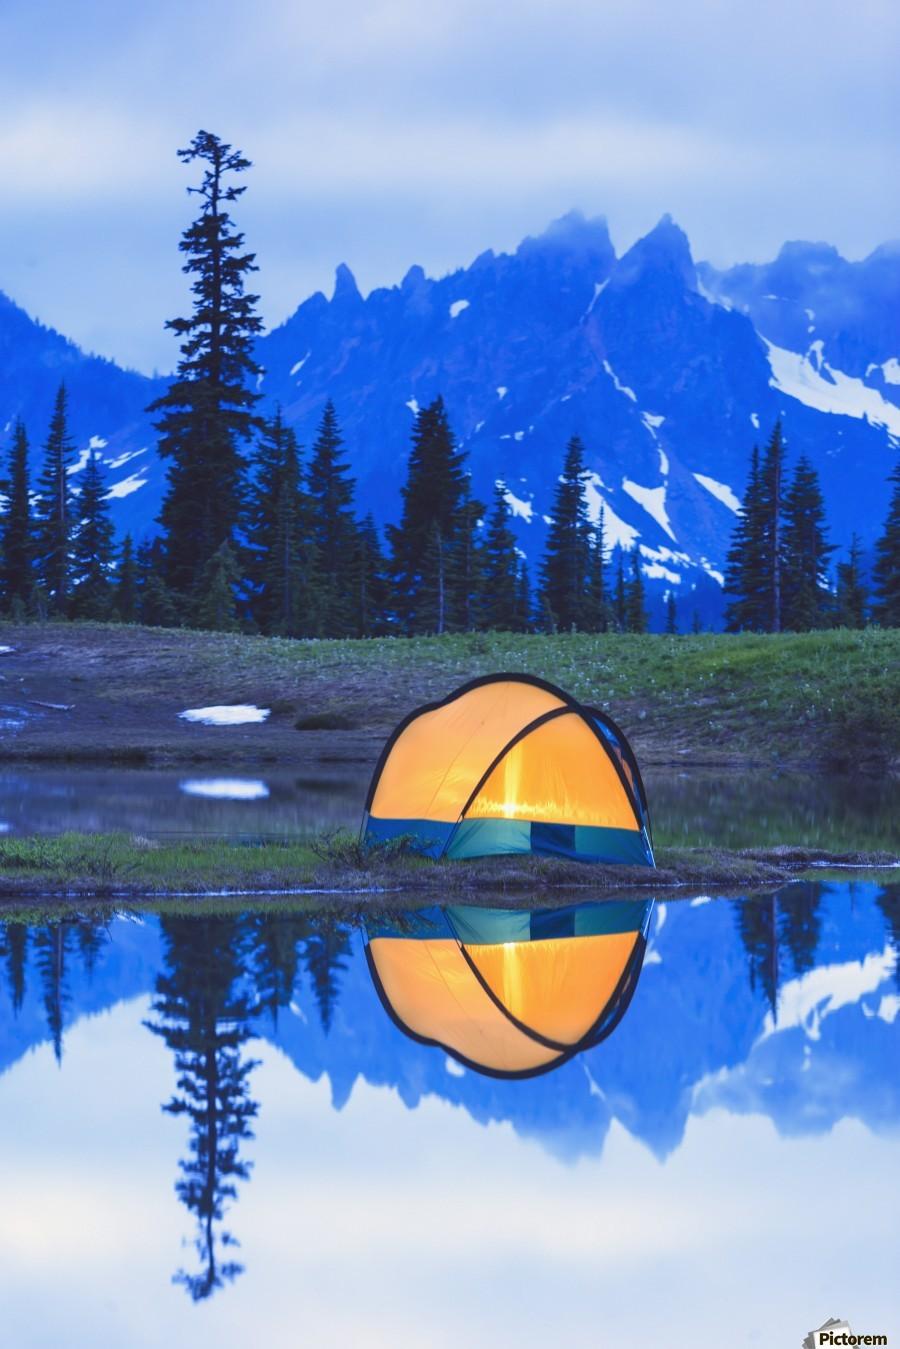 Camping tent at sunset small reflecting pond near tipsoo lake mount rainer national park near seattle;Washington united states of america  Print